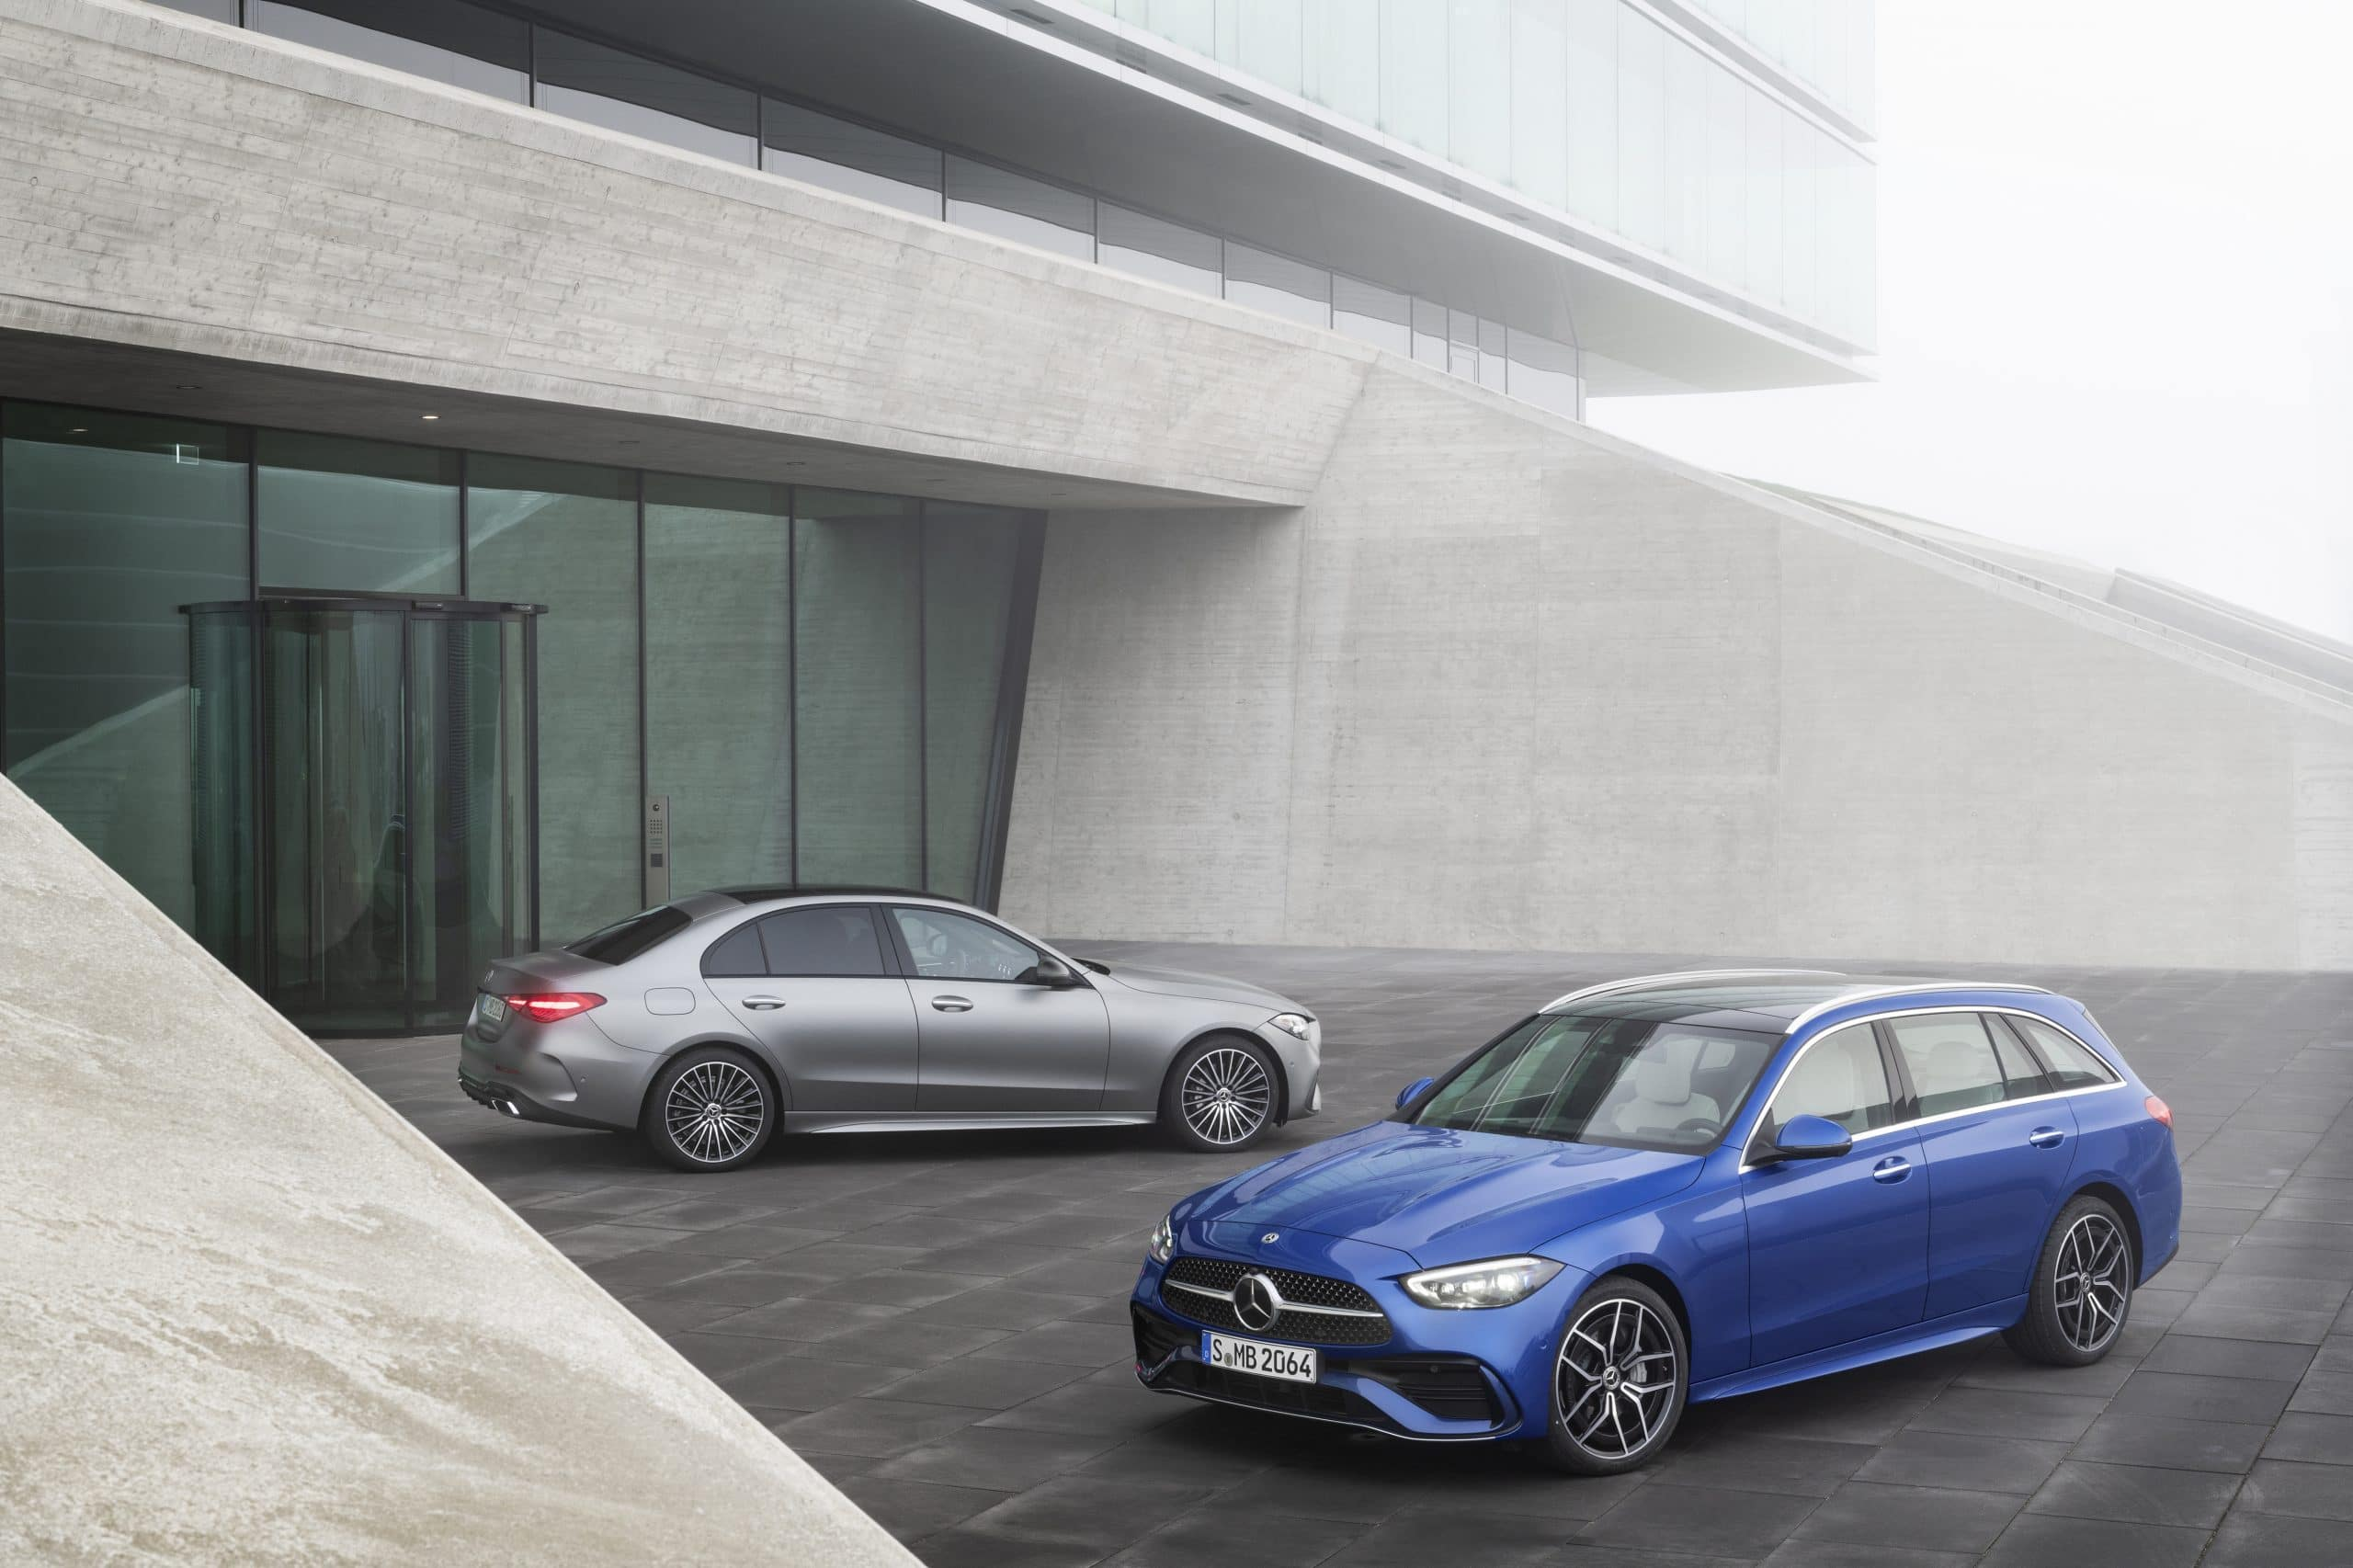 20C0677 015 scaled Η νέα Mercedes-Benz C-Class ήρθε και στην Ελλάδα C Class, Mercedes, Mercedes Benz, Mercedes Benz C Class, Mercedes C Class, zblog, ειδήσεις, Νέα